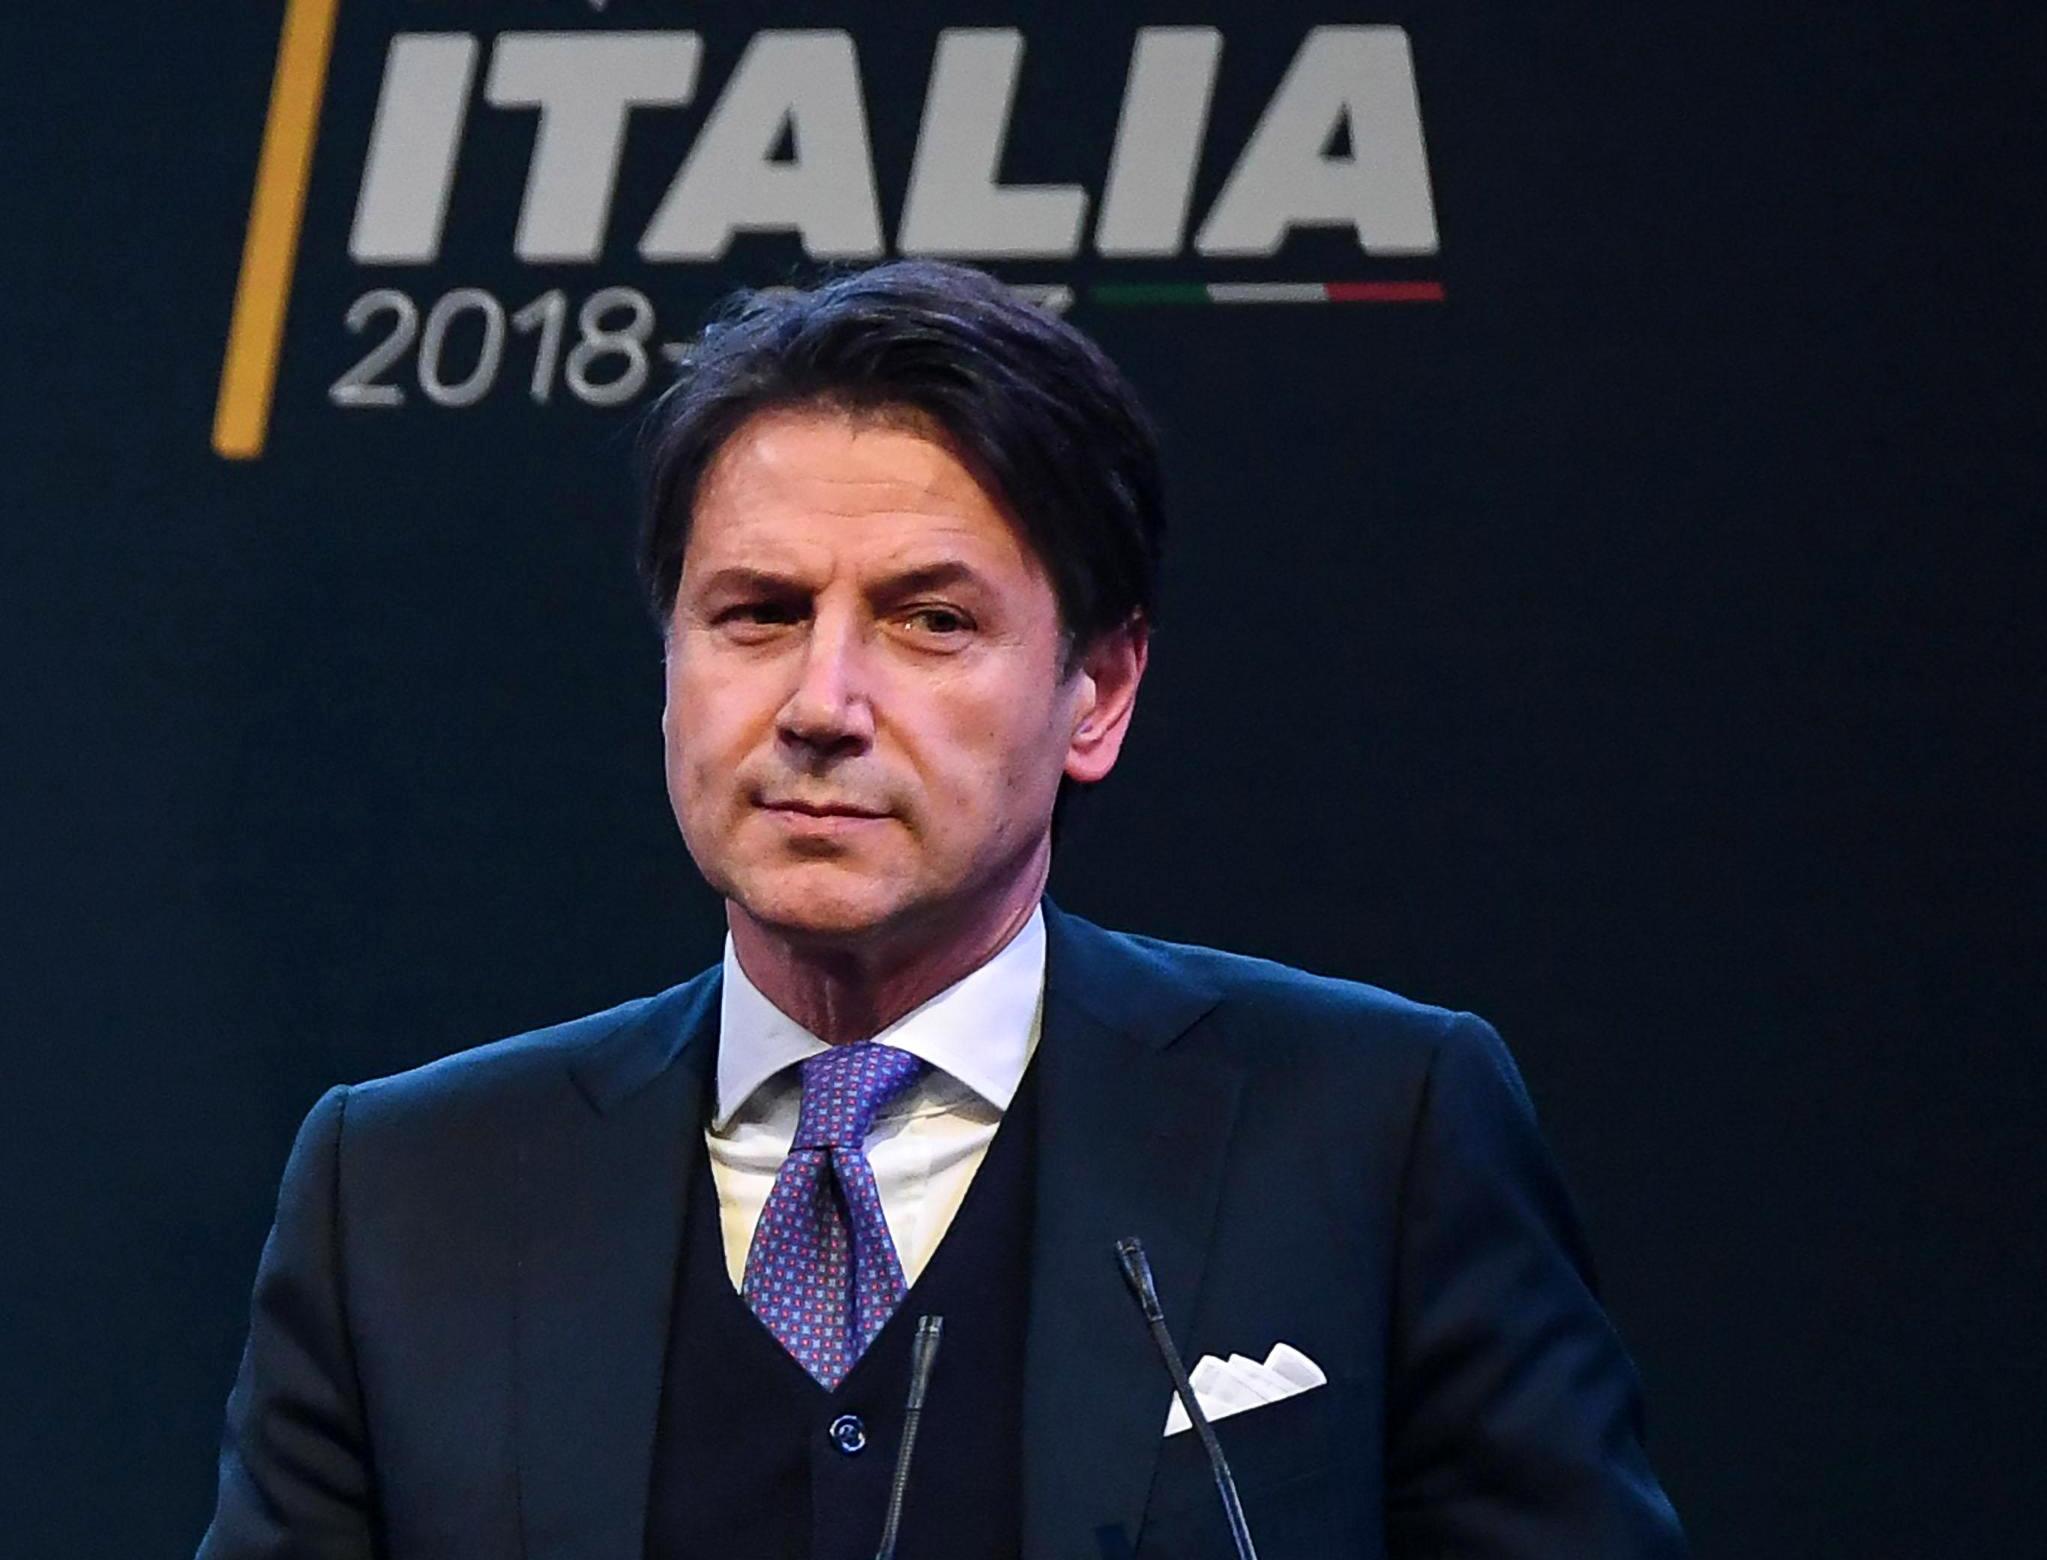 Talijanski profesor prava Giuseppe Conte kandidat za premijera